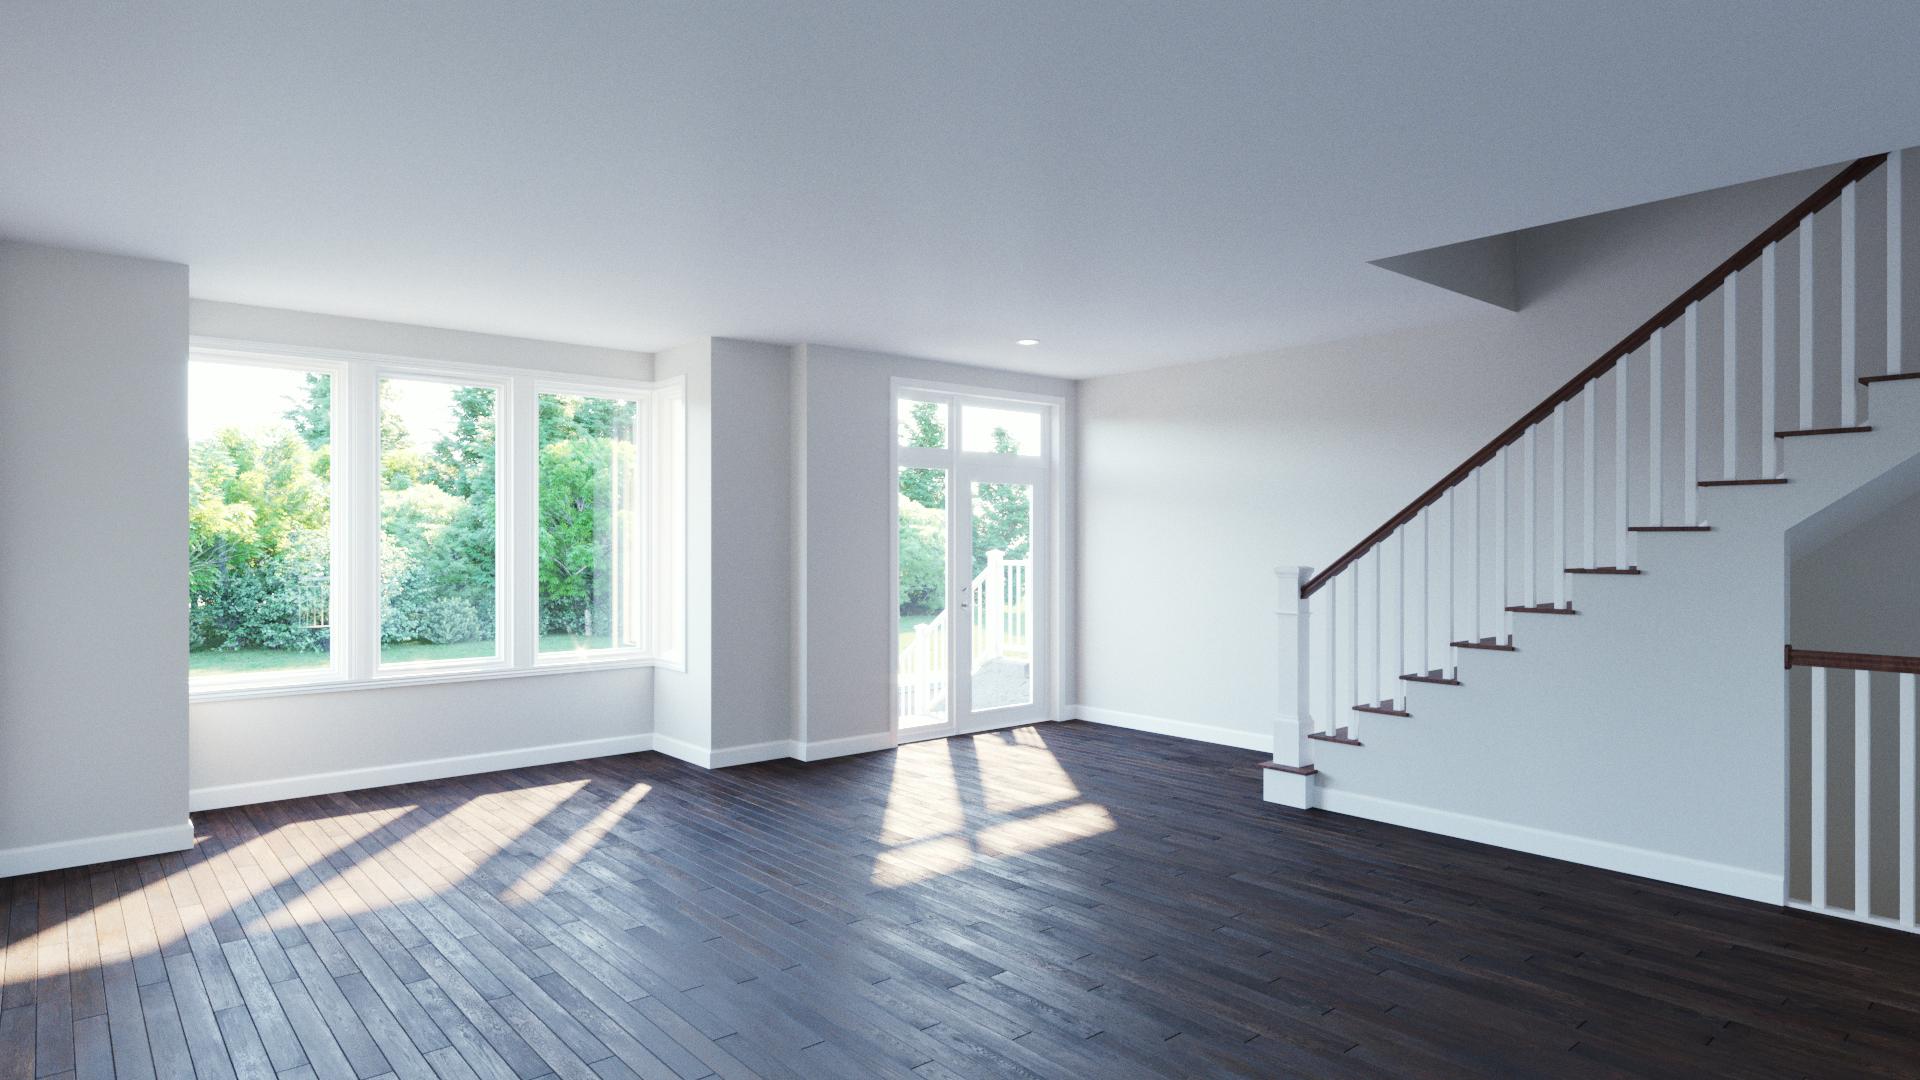 Wrigley_2nd_Floor_0002.jpg